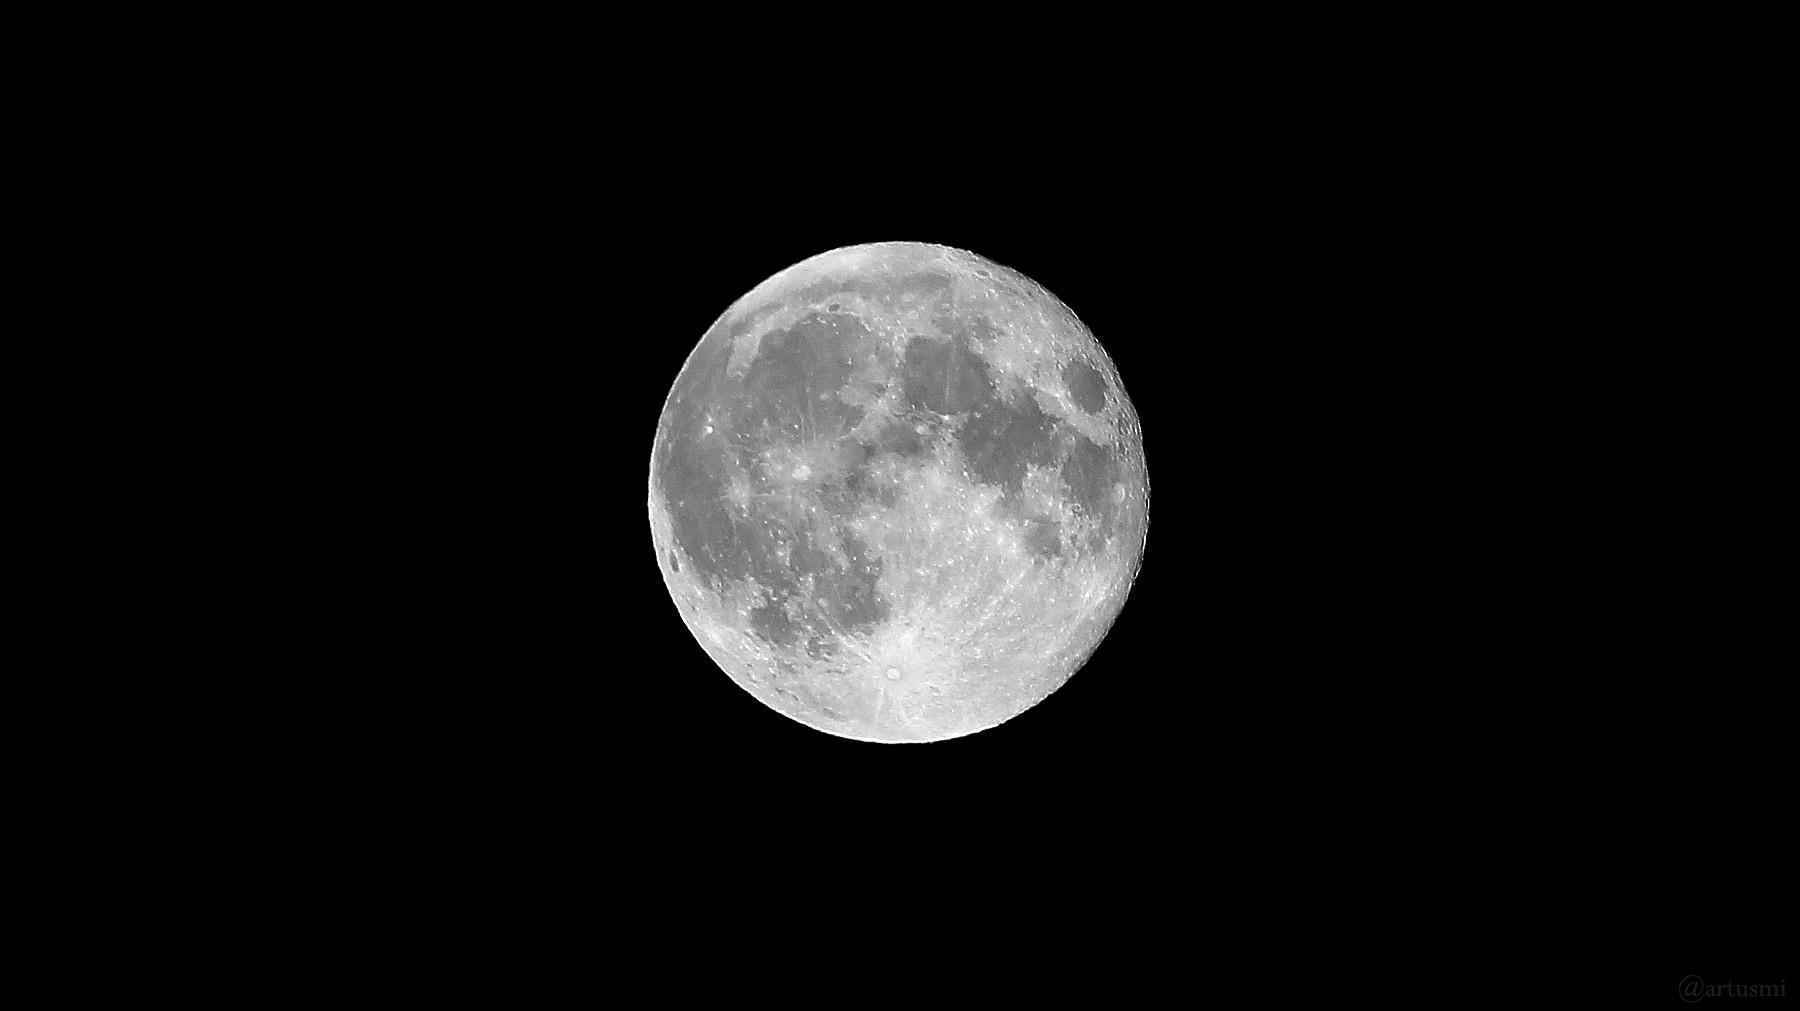 Abnehmender Mond am 27. Mai 2021 um 01:49 Uhr